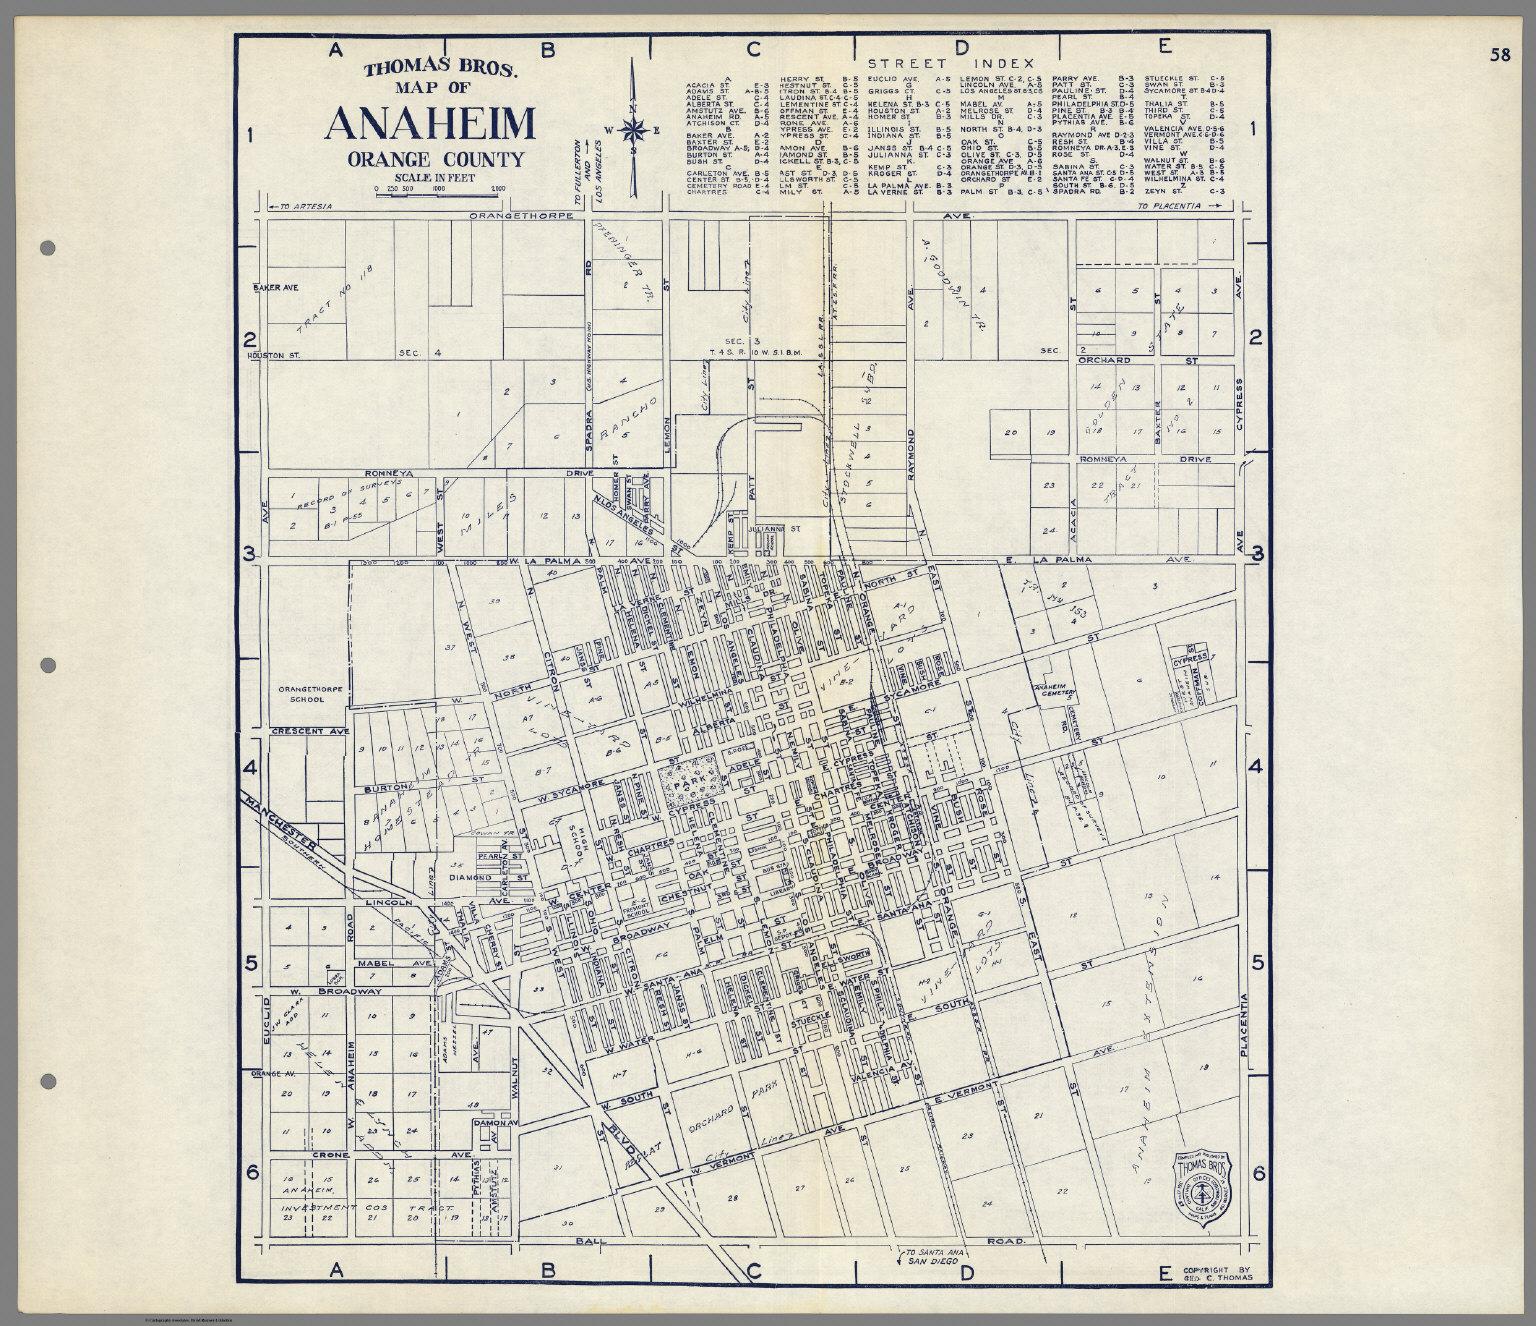 Thomas Bros Map of Anaheim Orange County California David